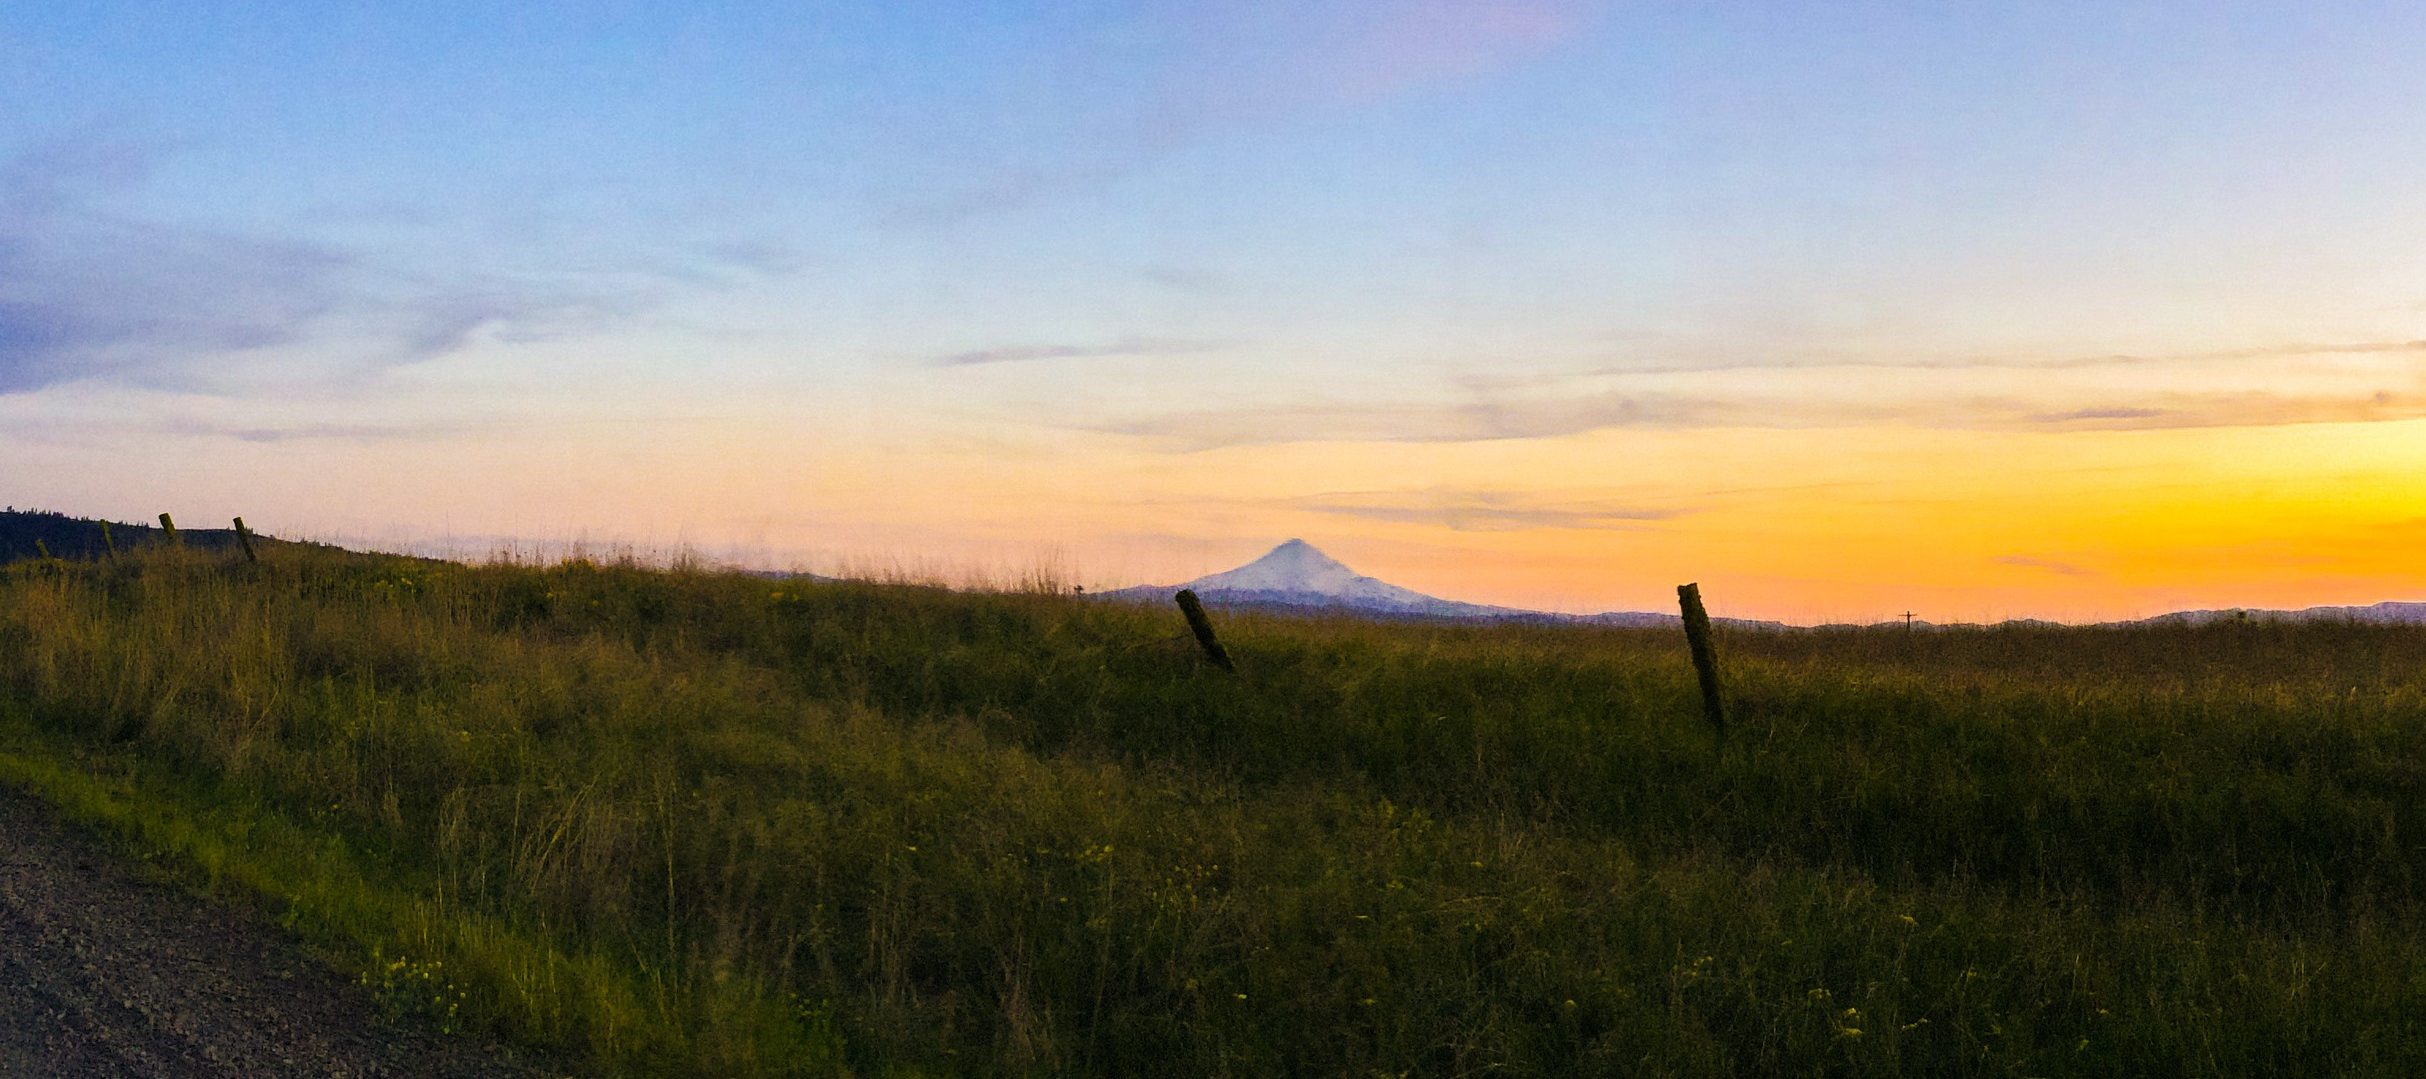 Mt Hood at Sunset from High Prairie Washington